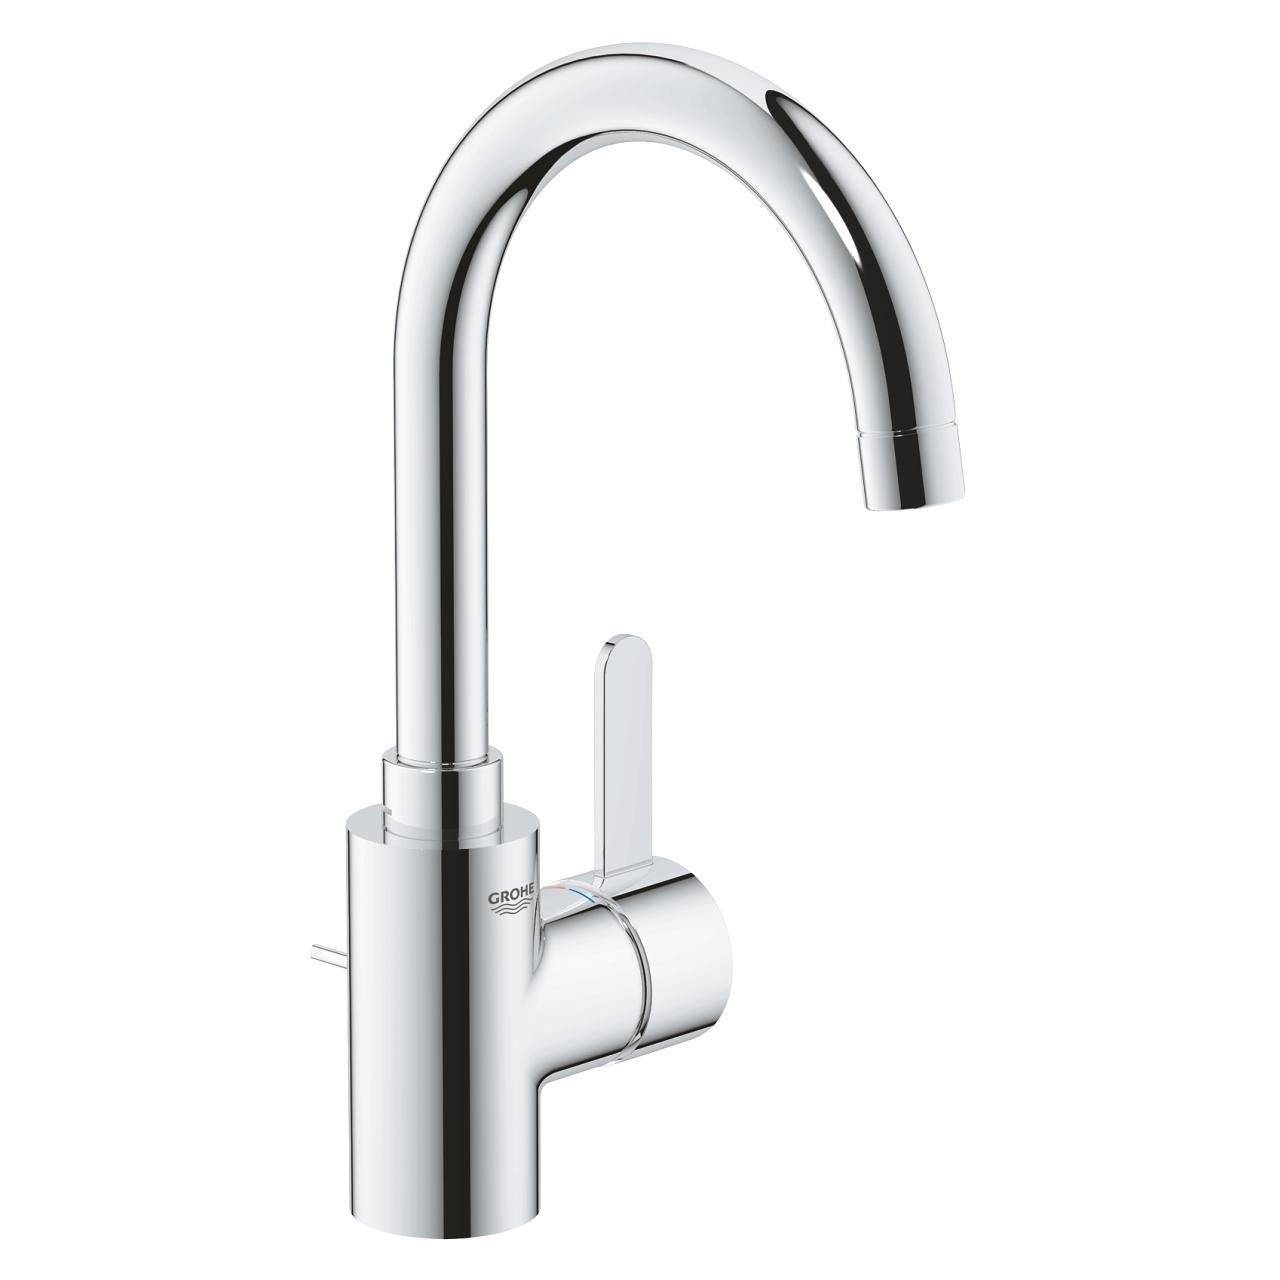 Mitigeur lavabo Eurosmart Cosmopolitan - Taille L Grohe